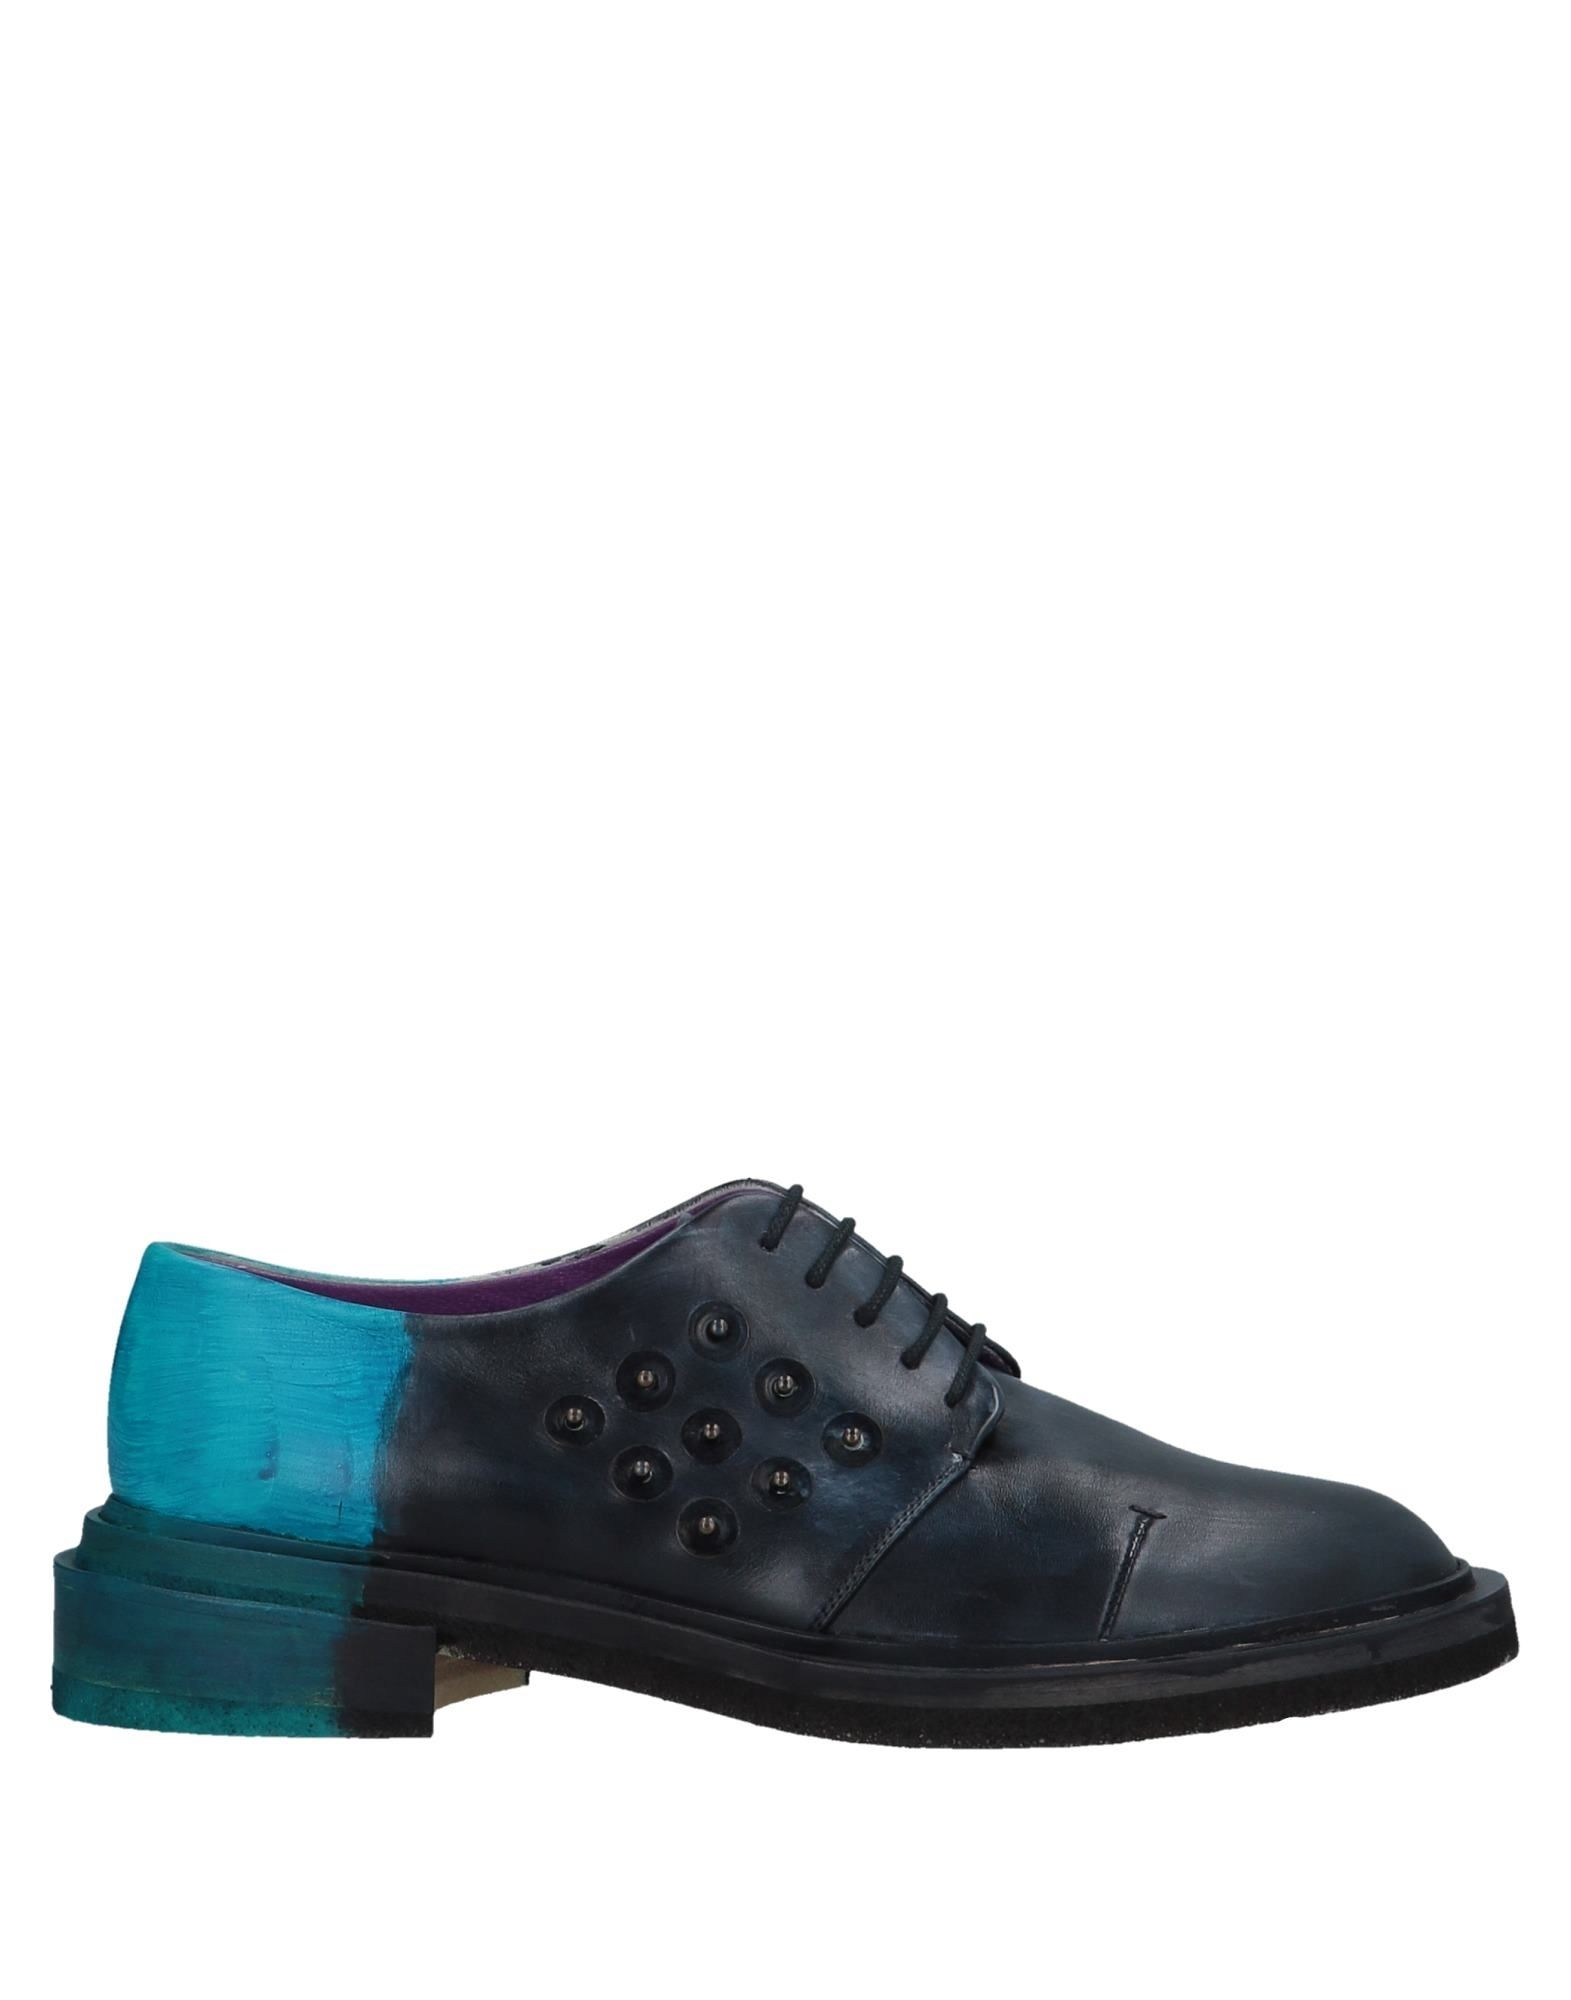 Rabatt Schuhe Massimo Giussani Schnürschuhe Damen  11538509RG